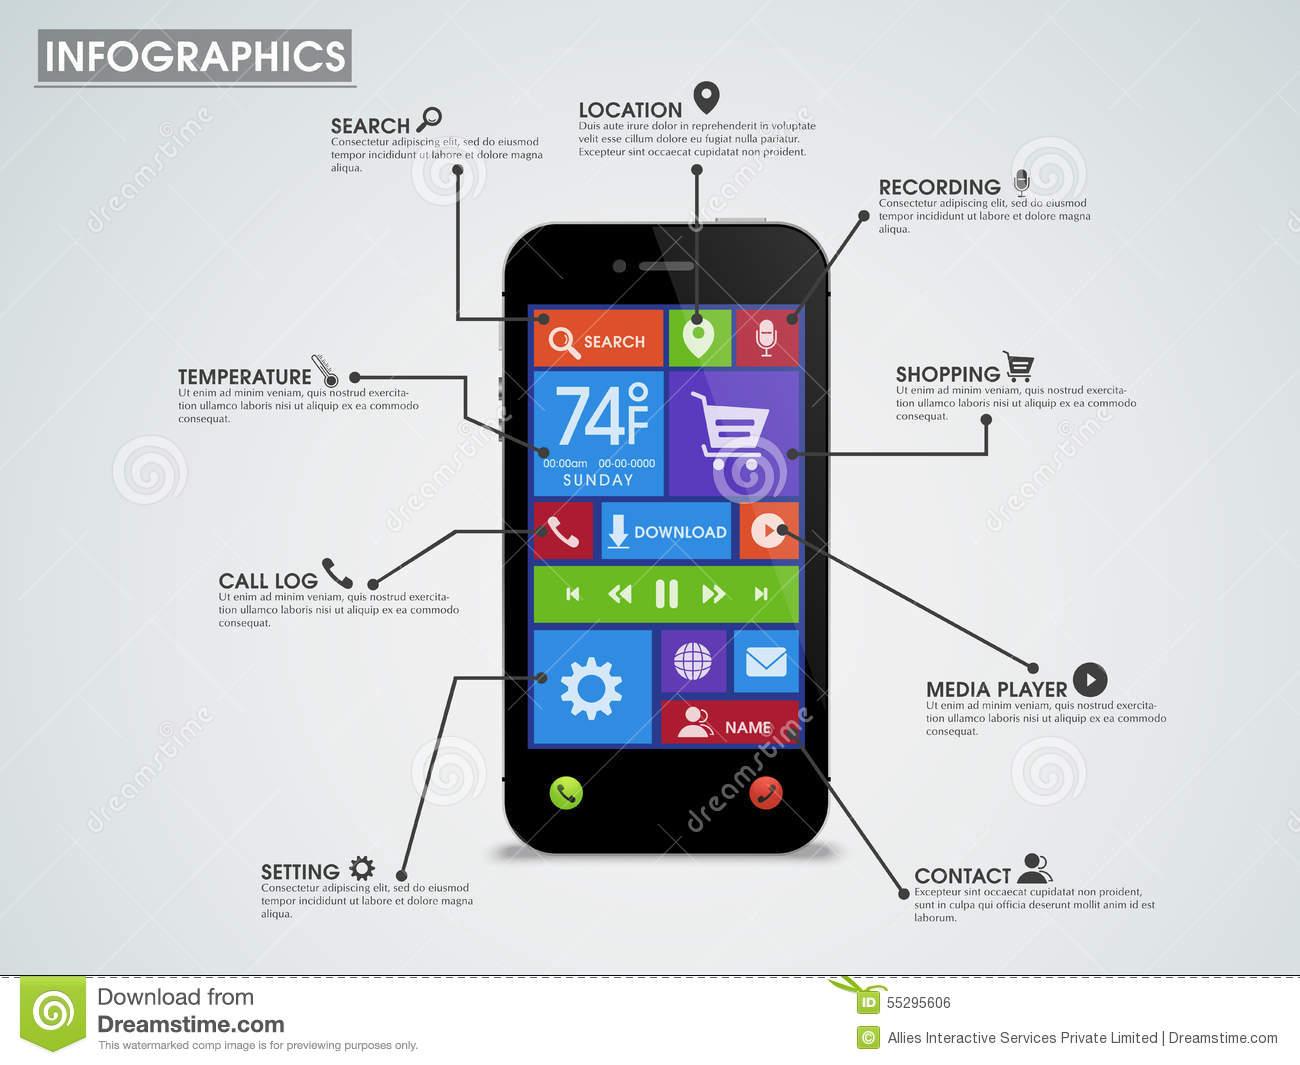 okostelefon funkciók 2018